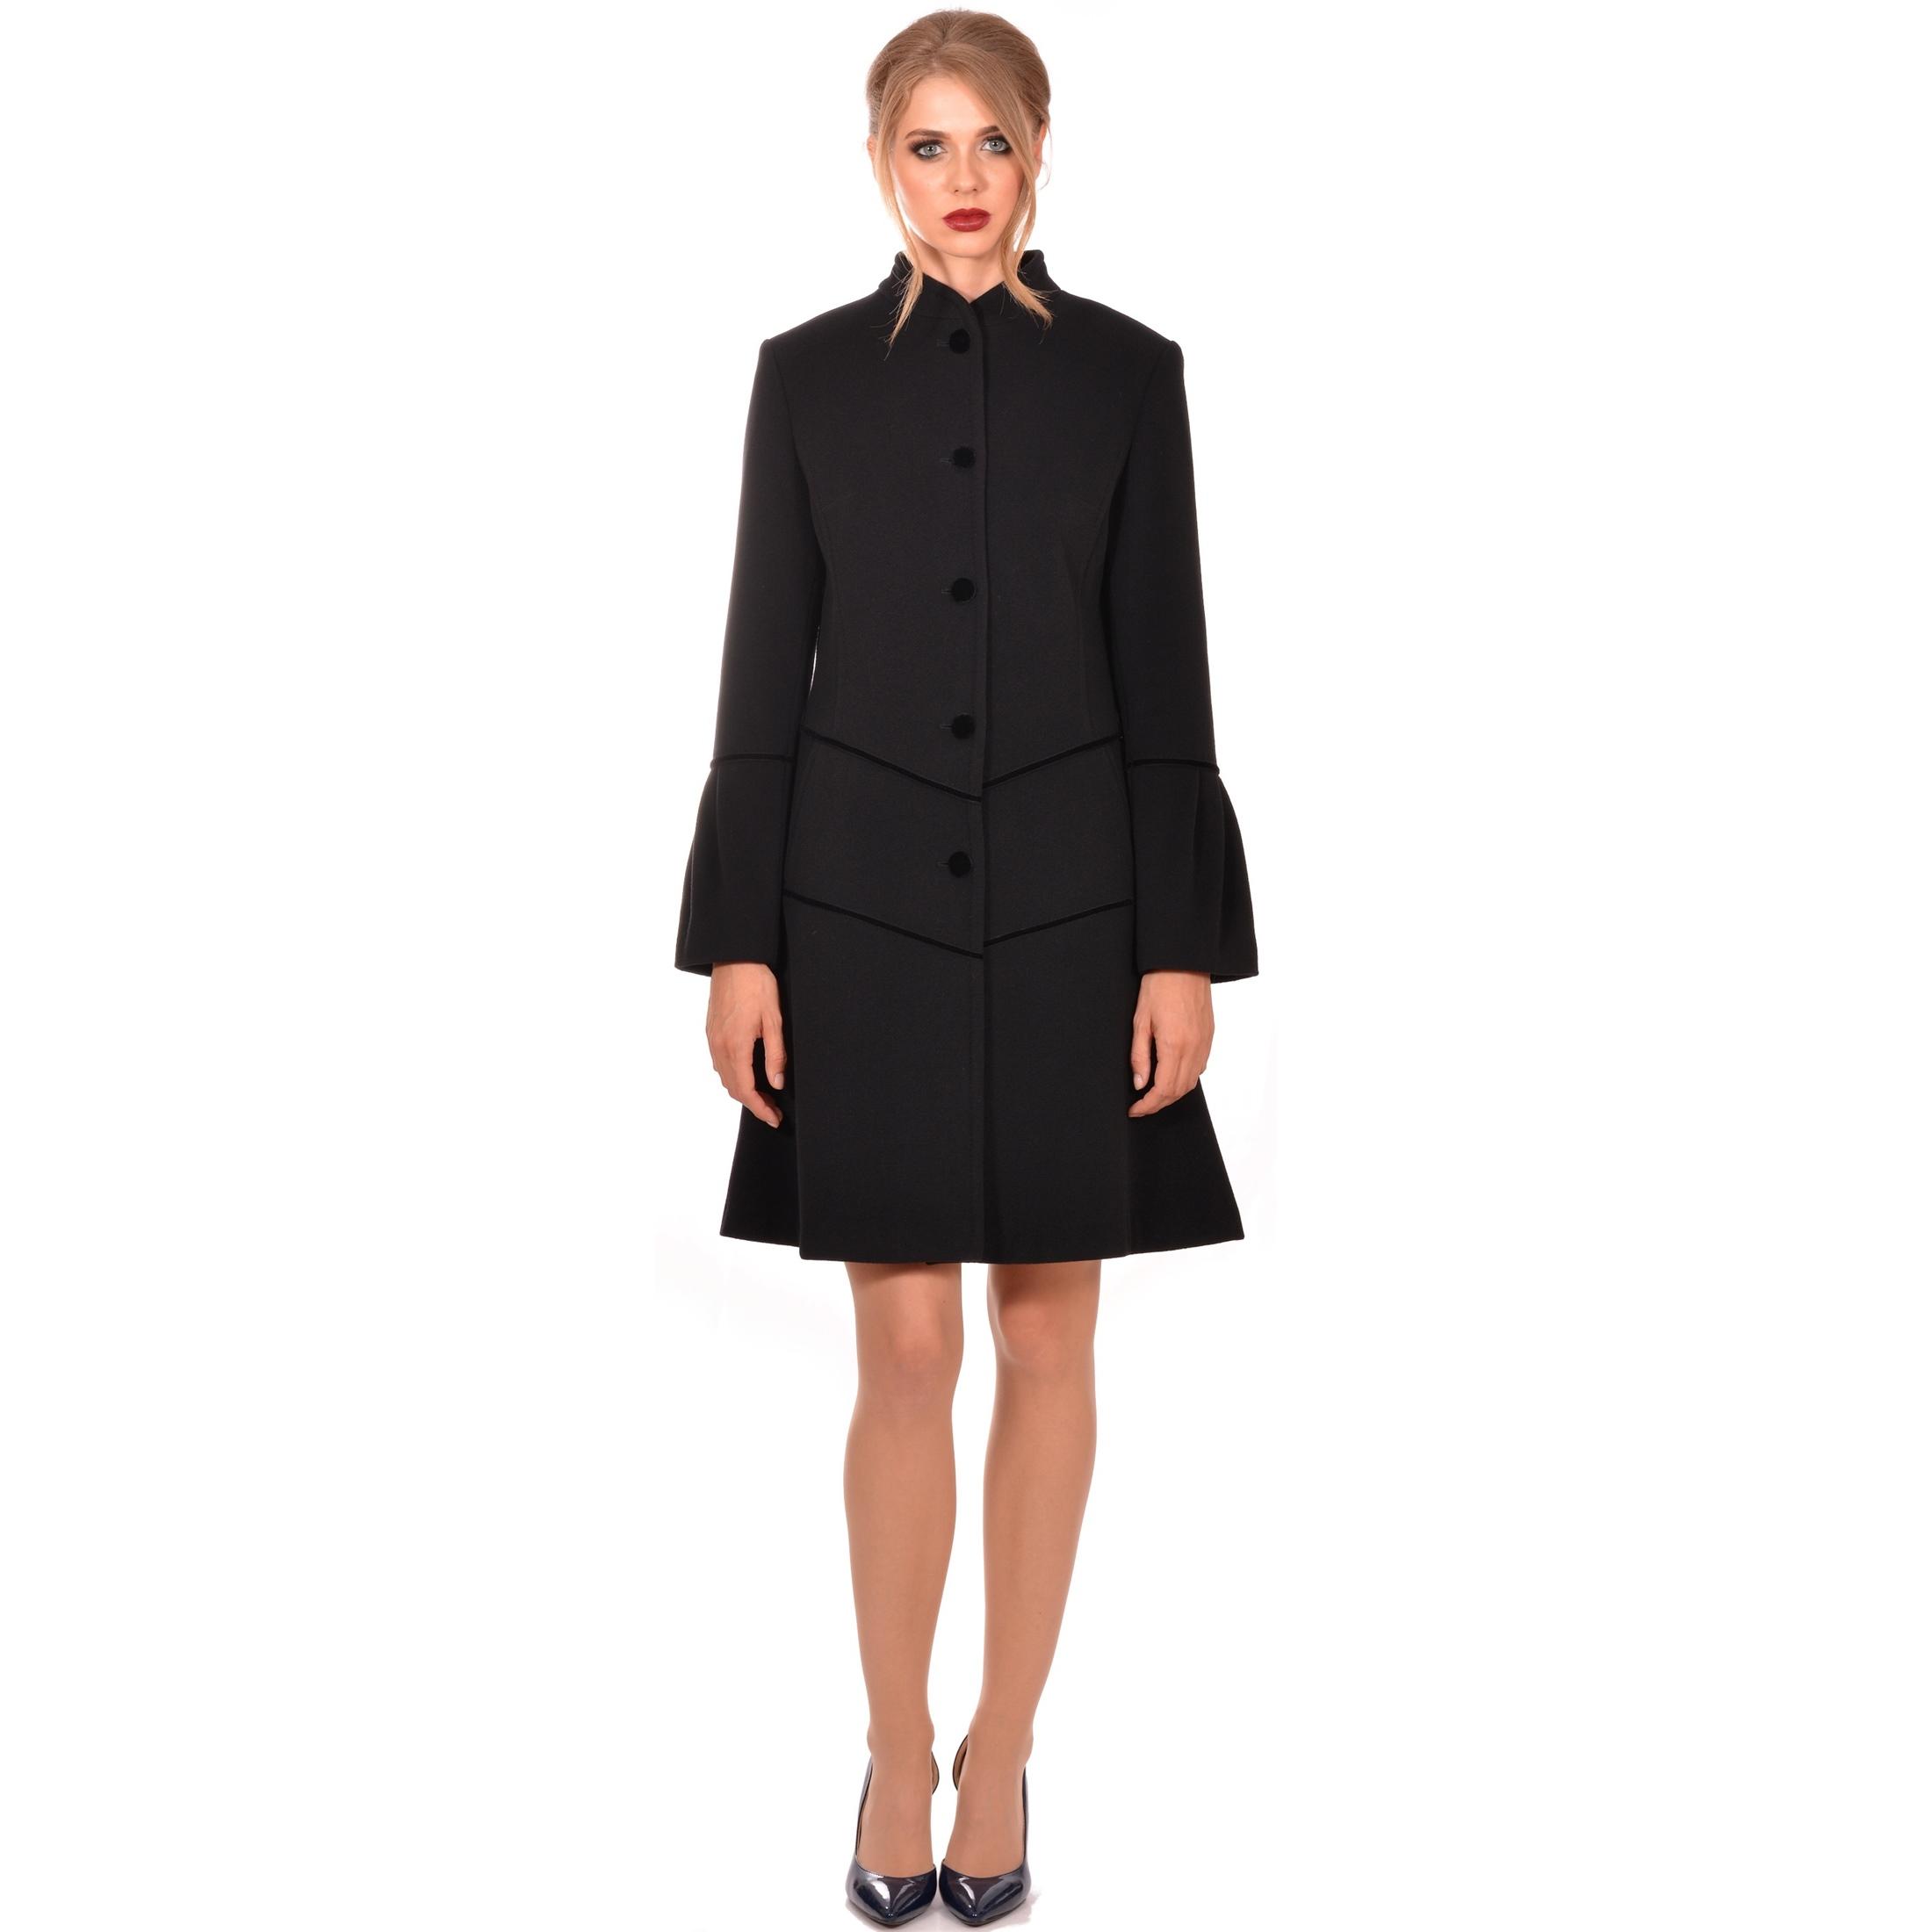 women's coat lady m, lady m kaput